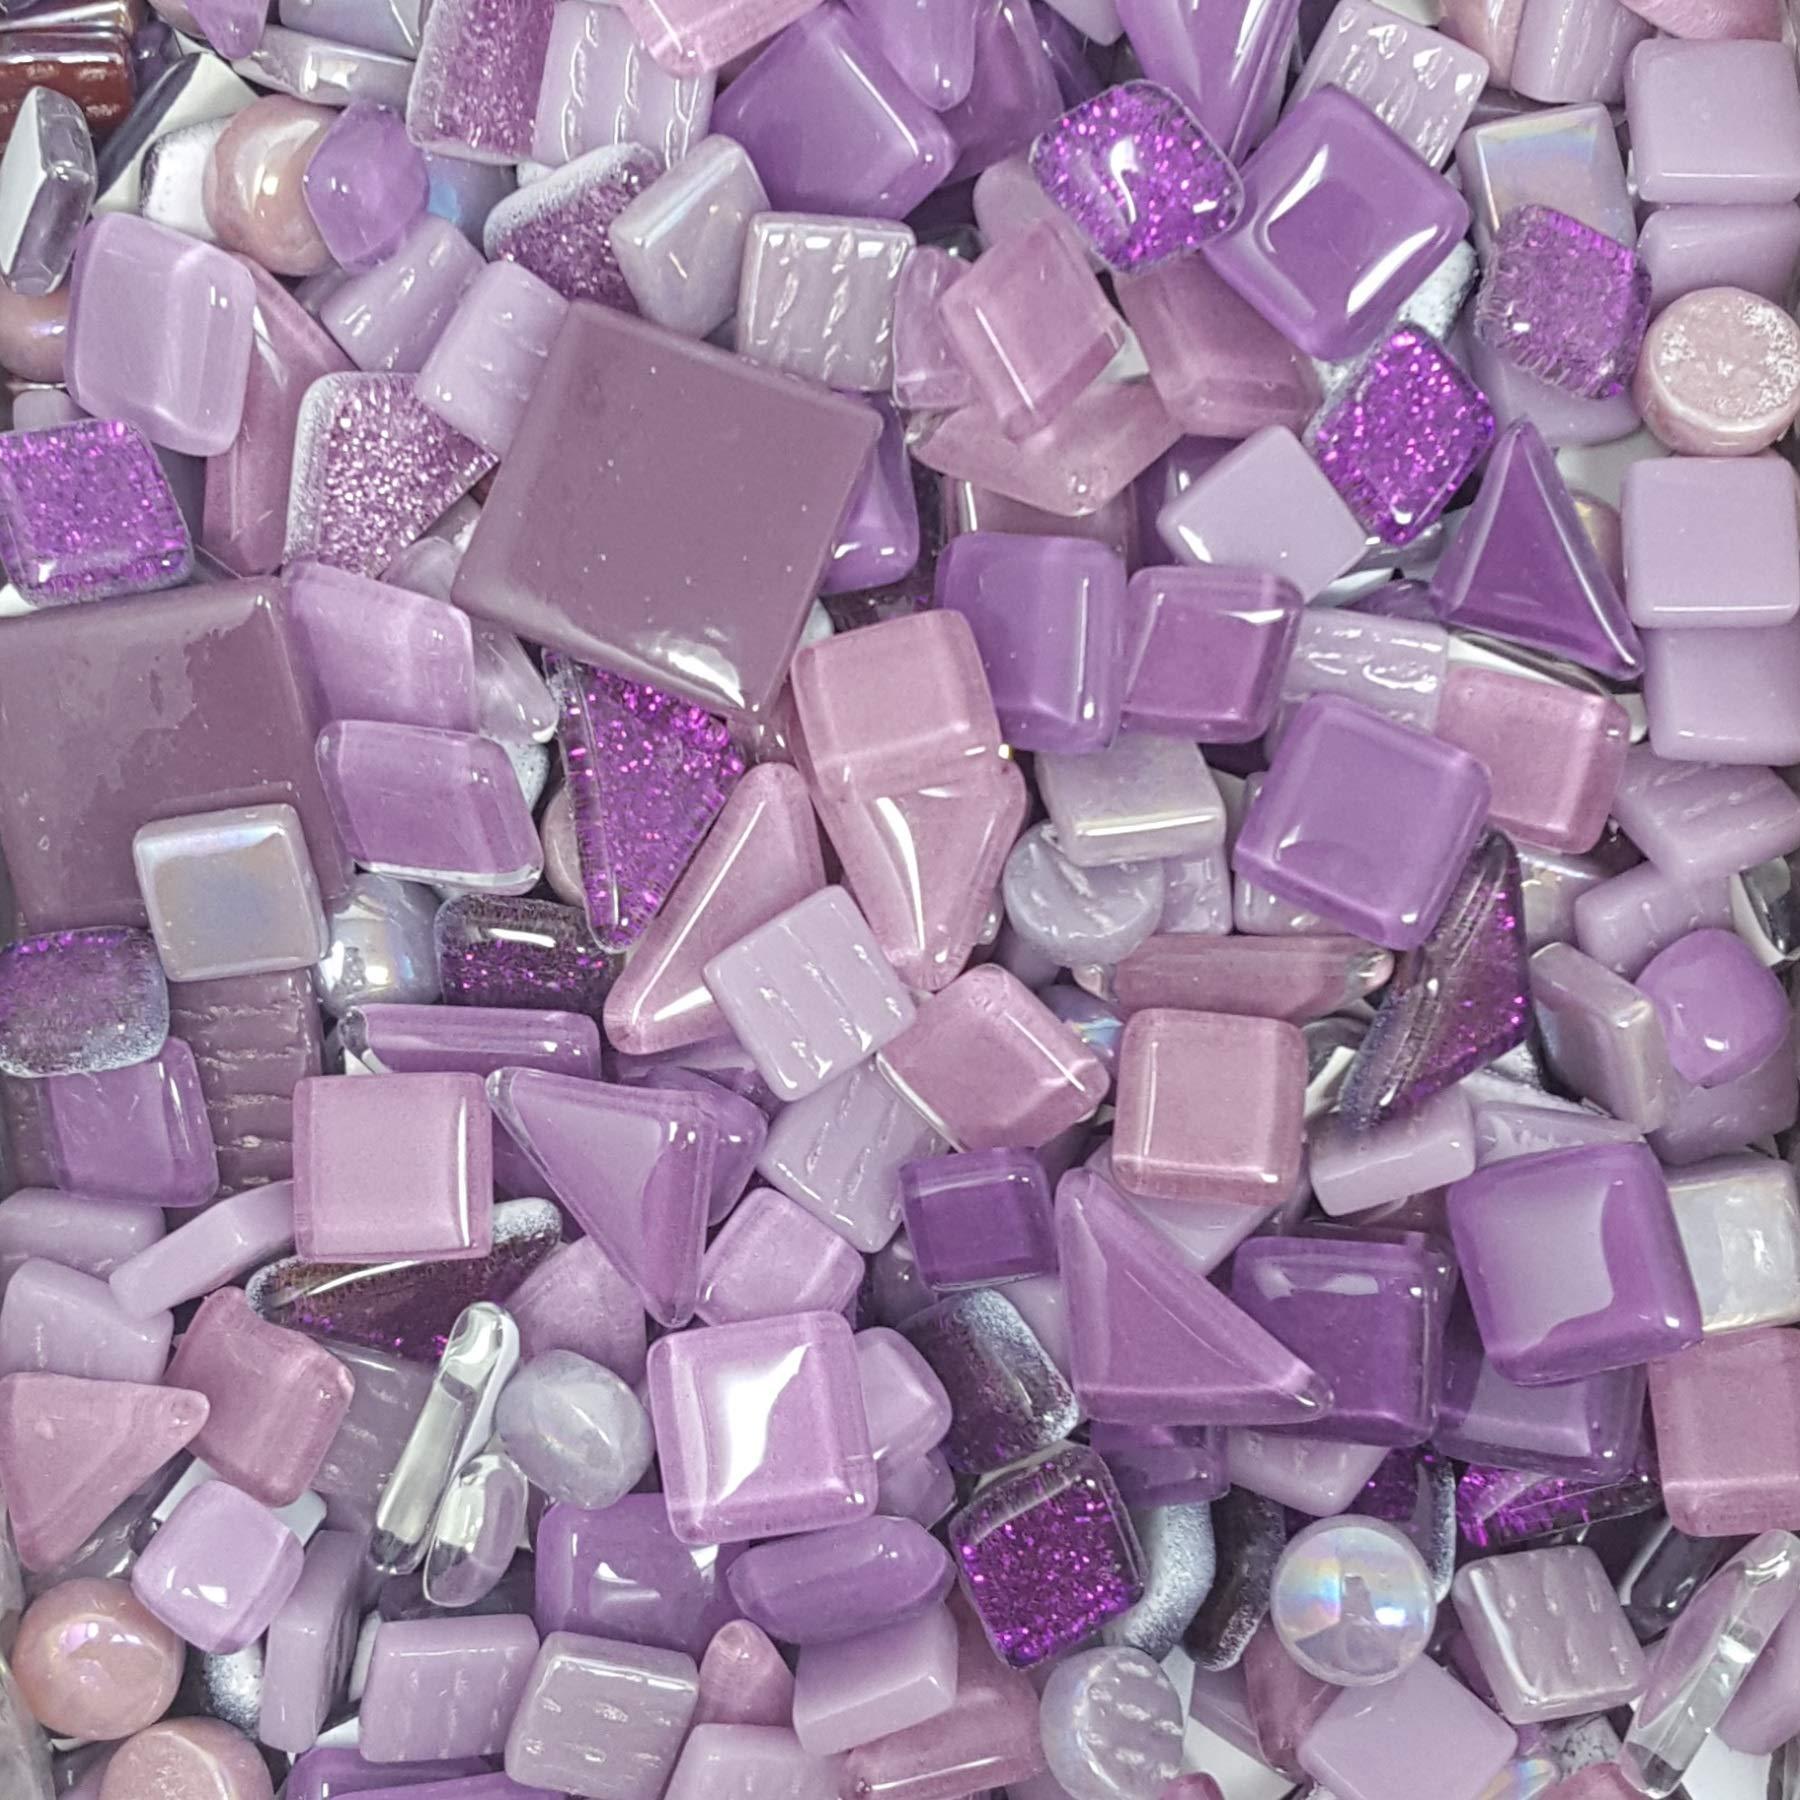 3 Pounds Mosaic Glass & Ceramic Tiles - Premium Lots Bulk Mosaic Tiles Craft Supplies (Purples)